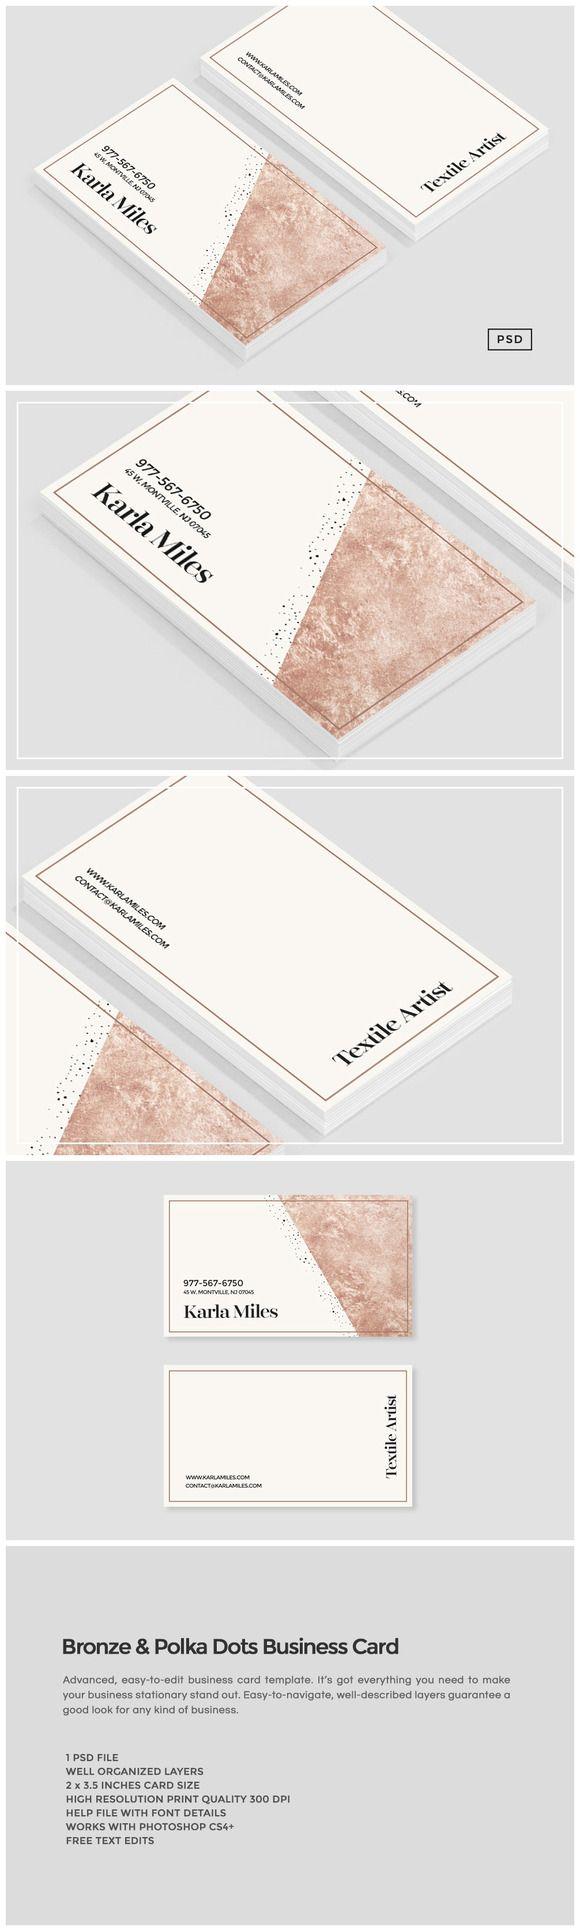 Bronze polka dots business card business card templates on bronze polka dots business card wajeb Choice Image